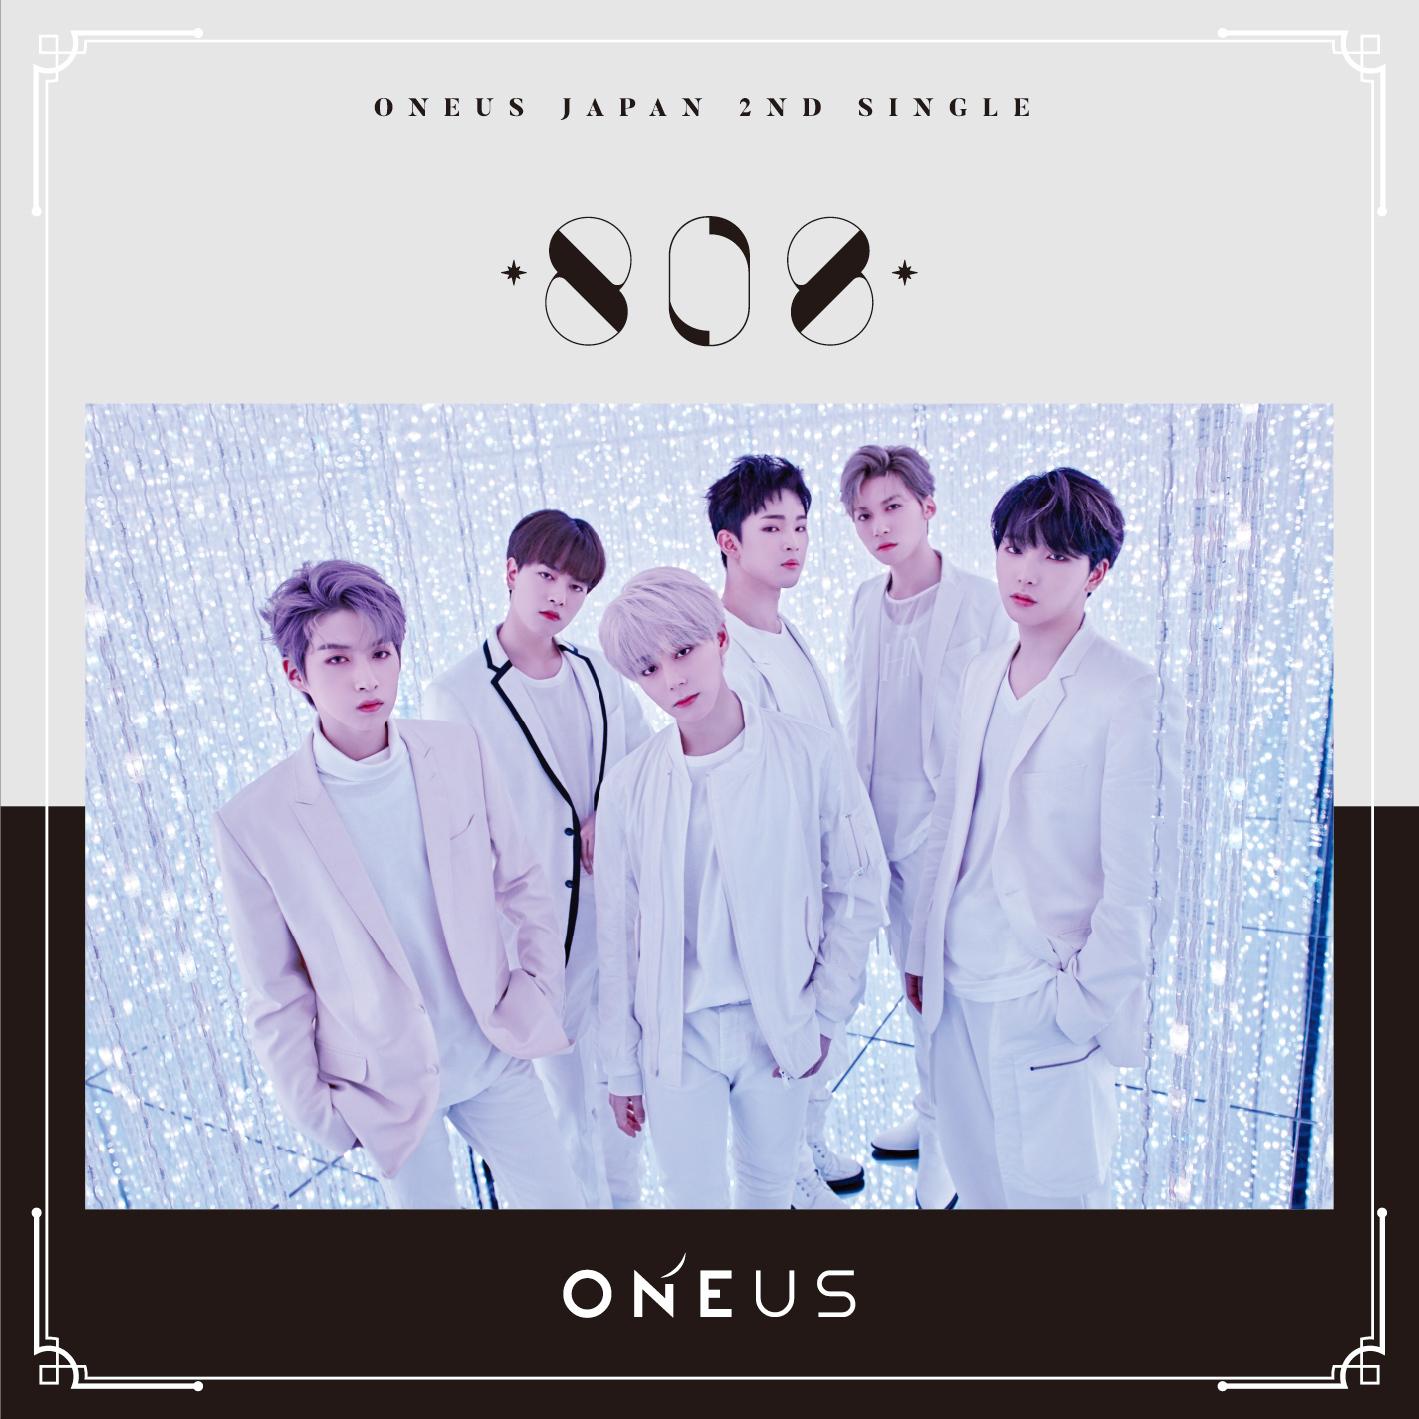 ONEUS Japan 2nd Single「808」通常盤B